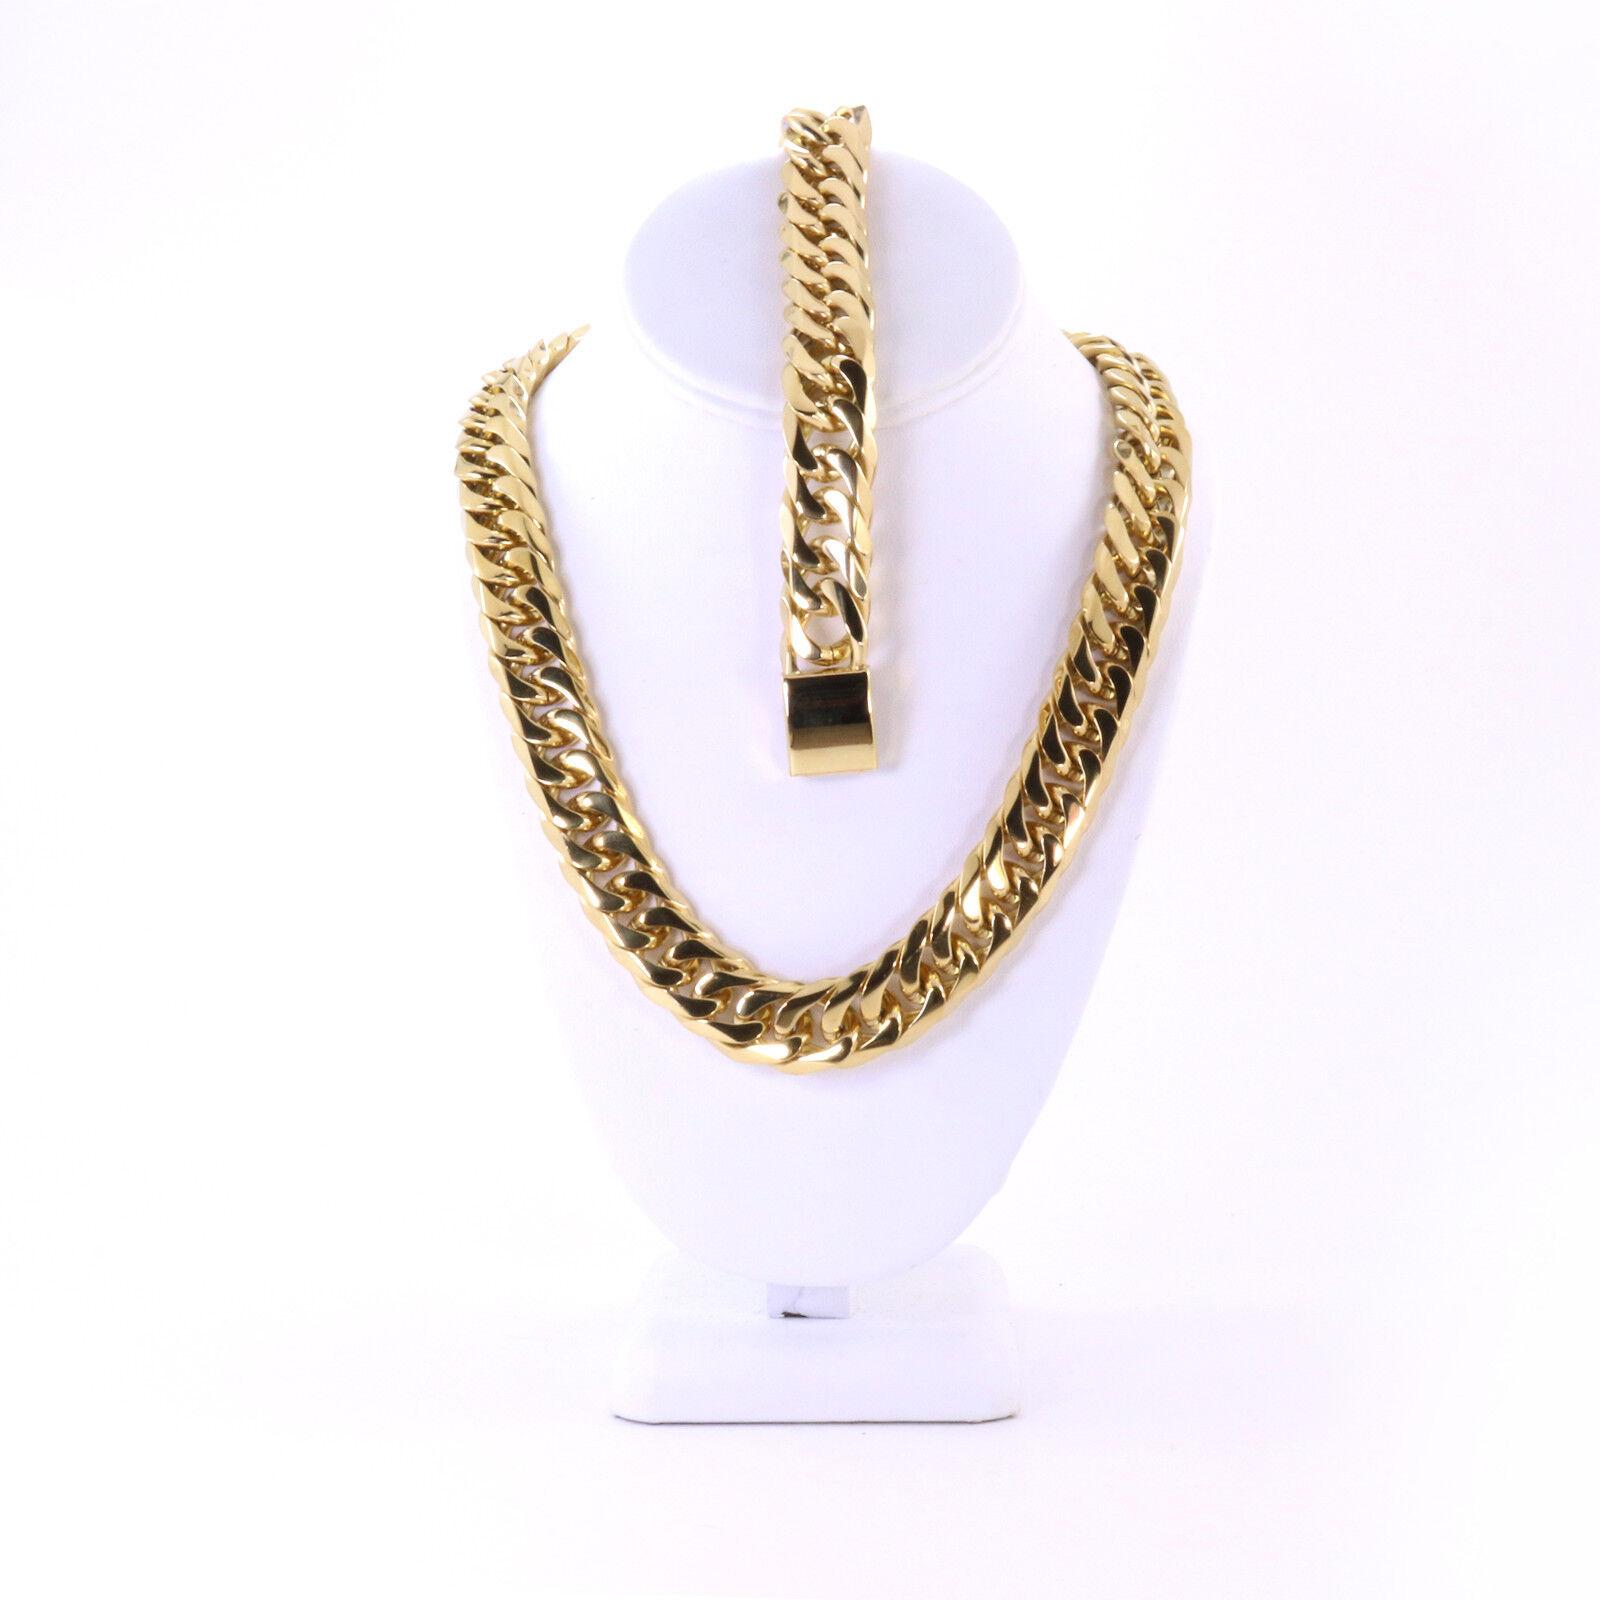 5d2d5eb2f14eb Details about Miami Cuban Chain Mens 18mm Large Thick 14K Gold Plated JayZ  Bracelet Set